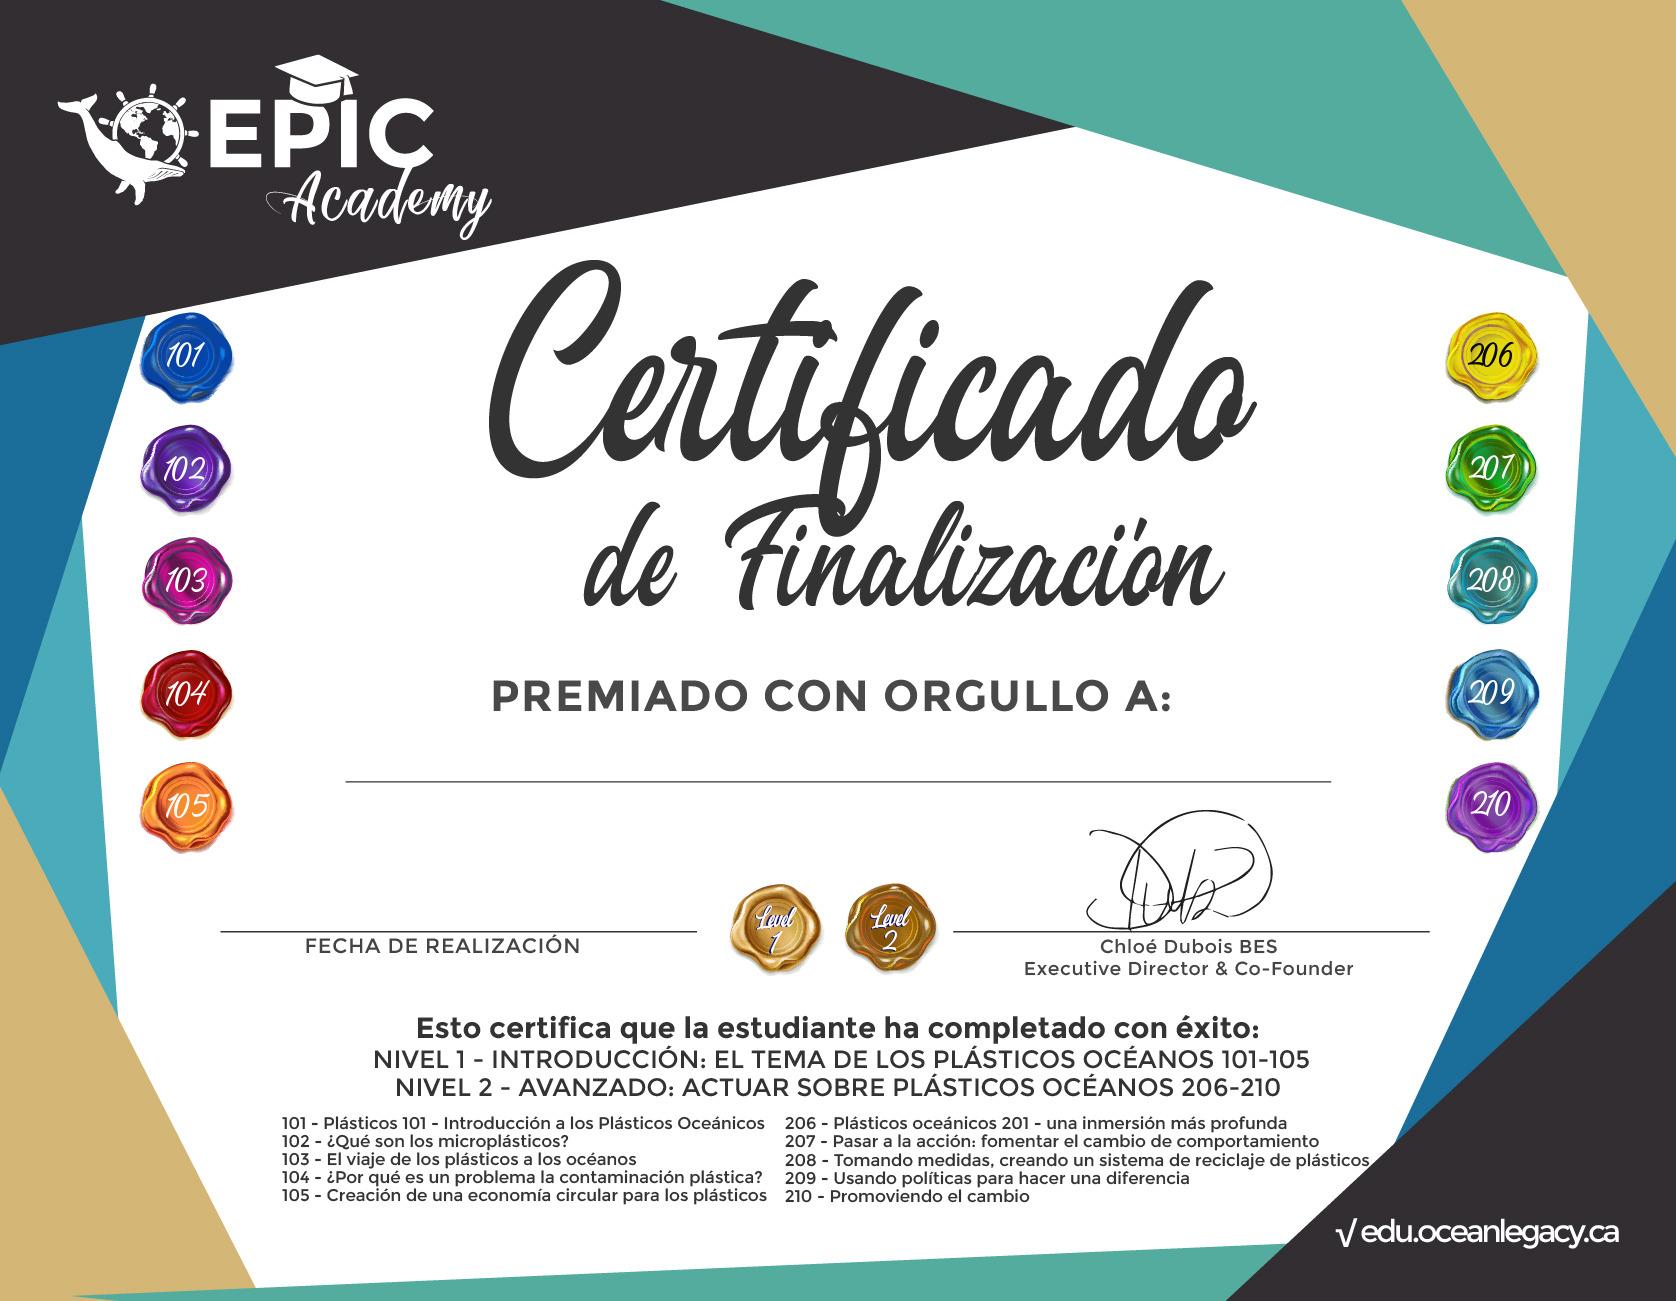 EPIC-Academy-Certificate-FINAL2021-ES_certificate OLF